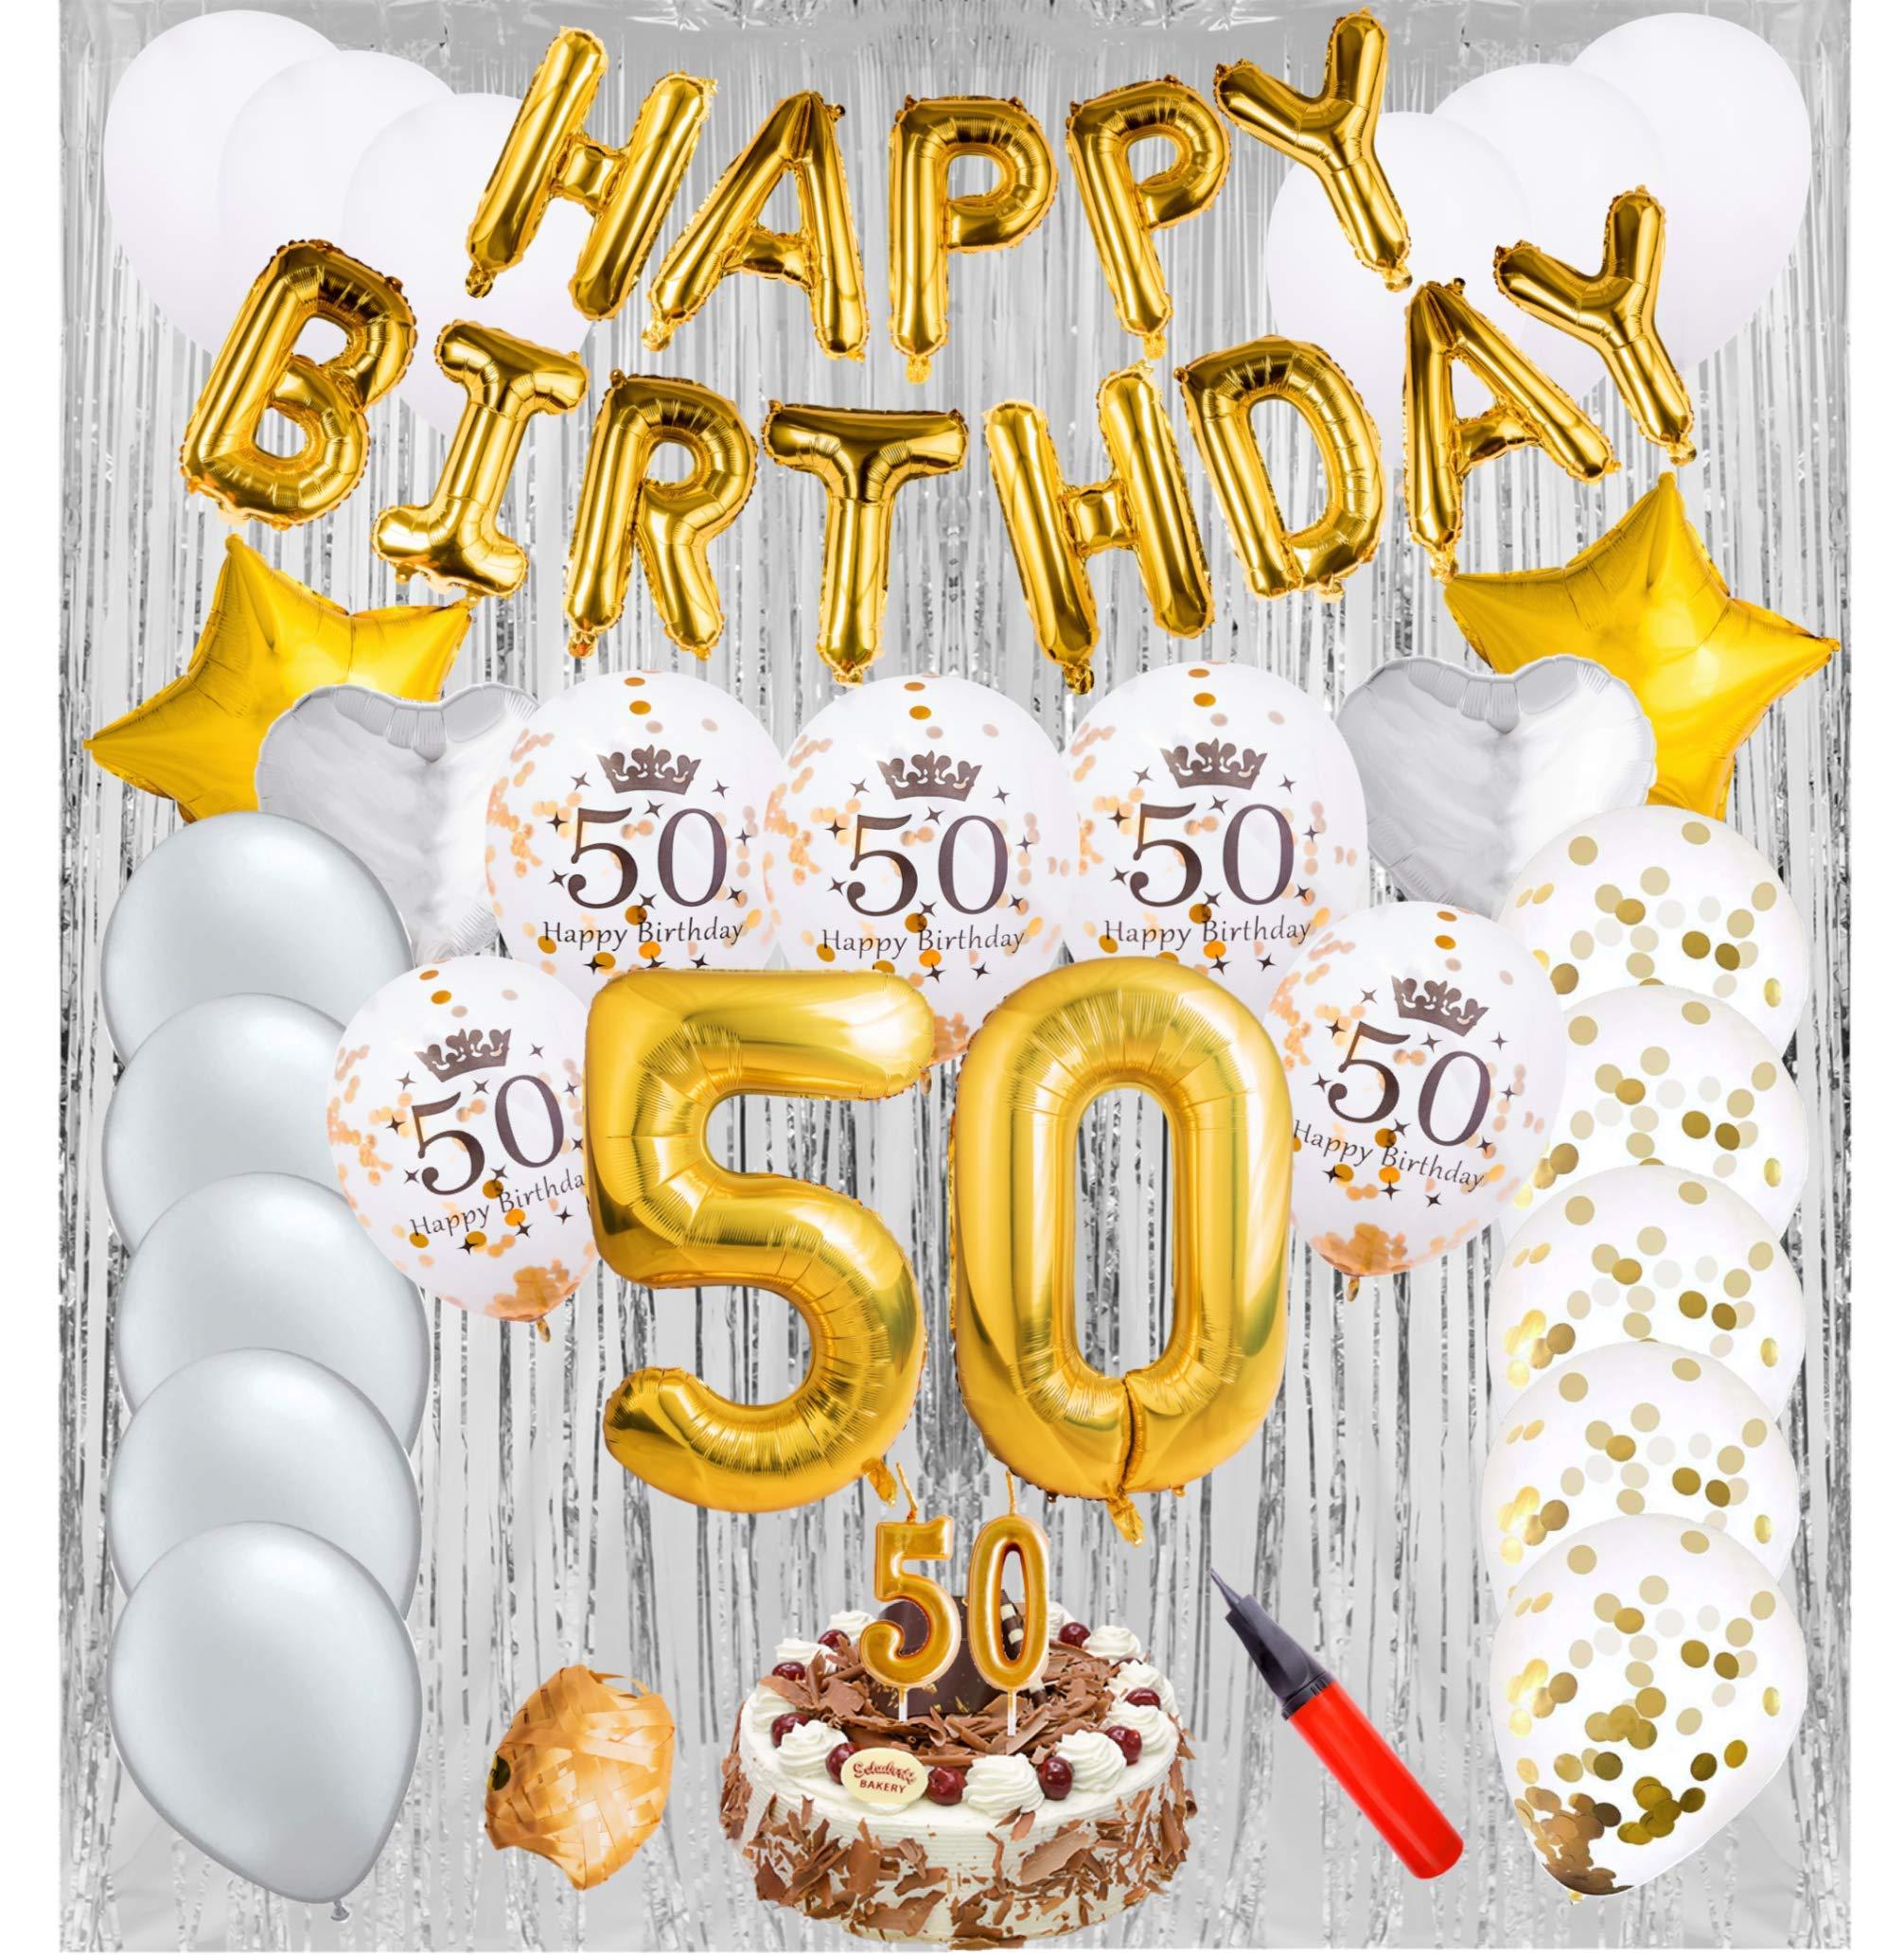 50th Birthday Decorations